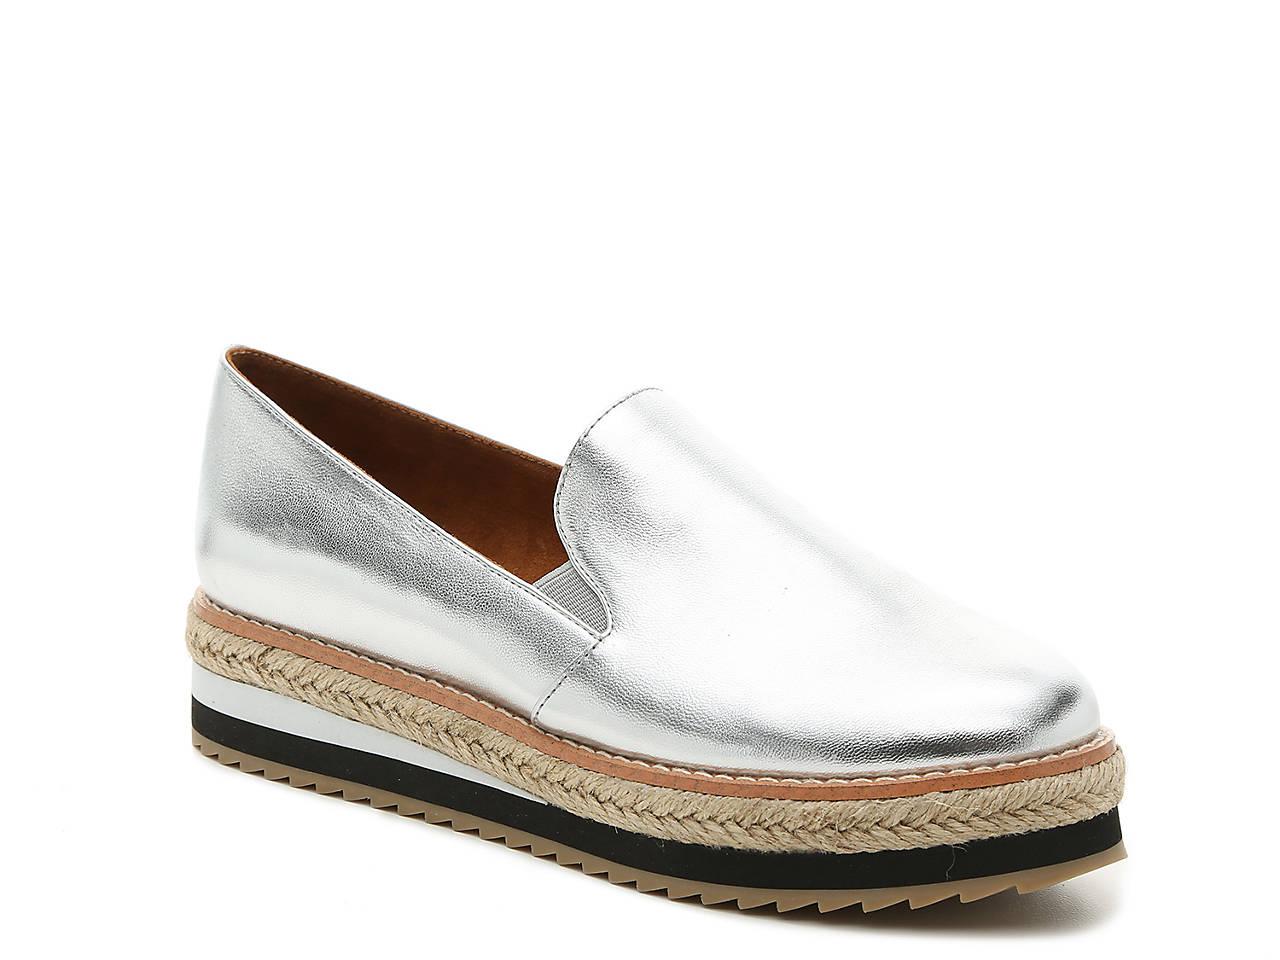 02ad1946378 Crown Vintage Bina Espadrille Wedge Loafer Women s Shoes